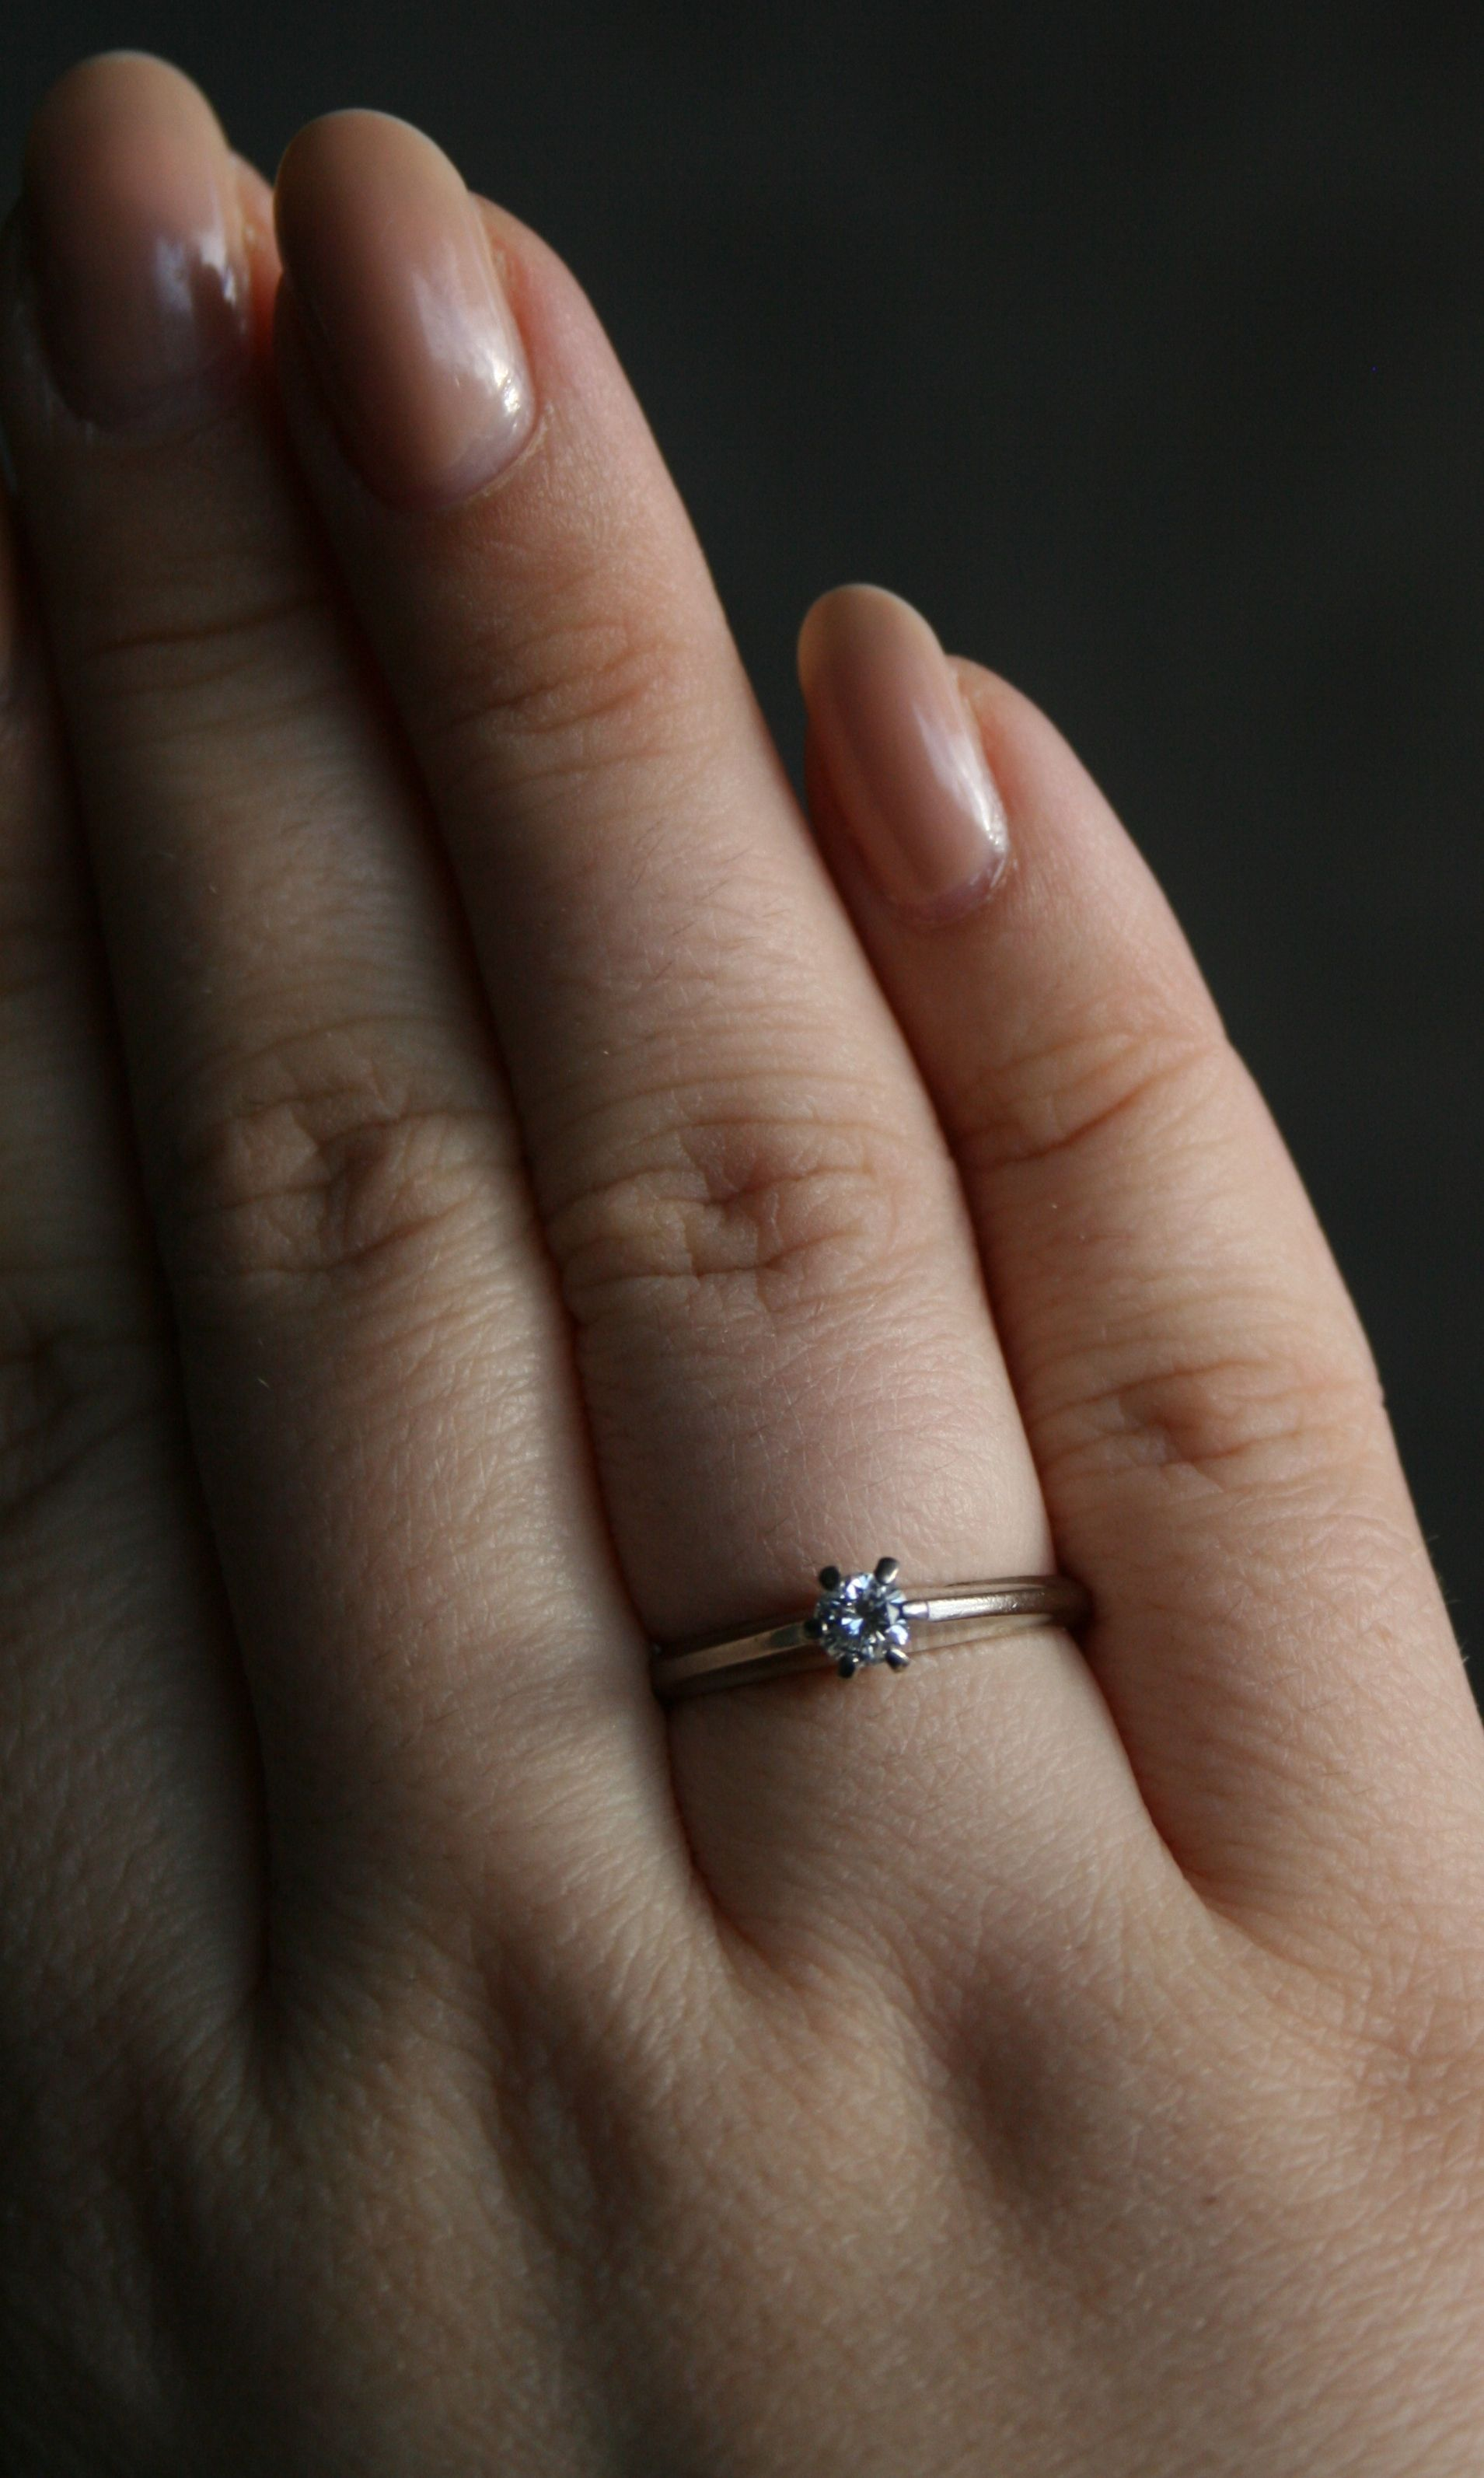 3/8 Carat Diamond Ring On Finger